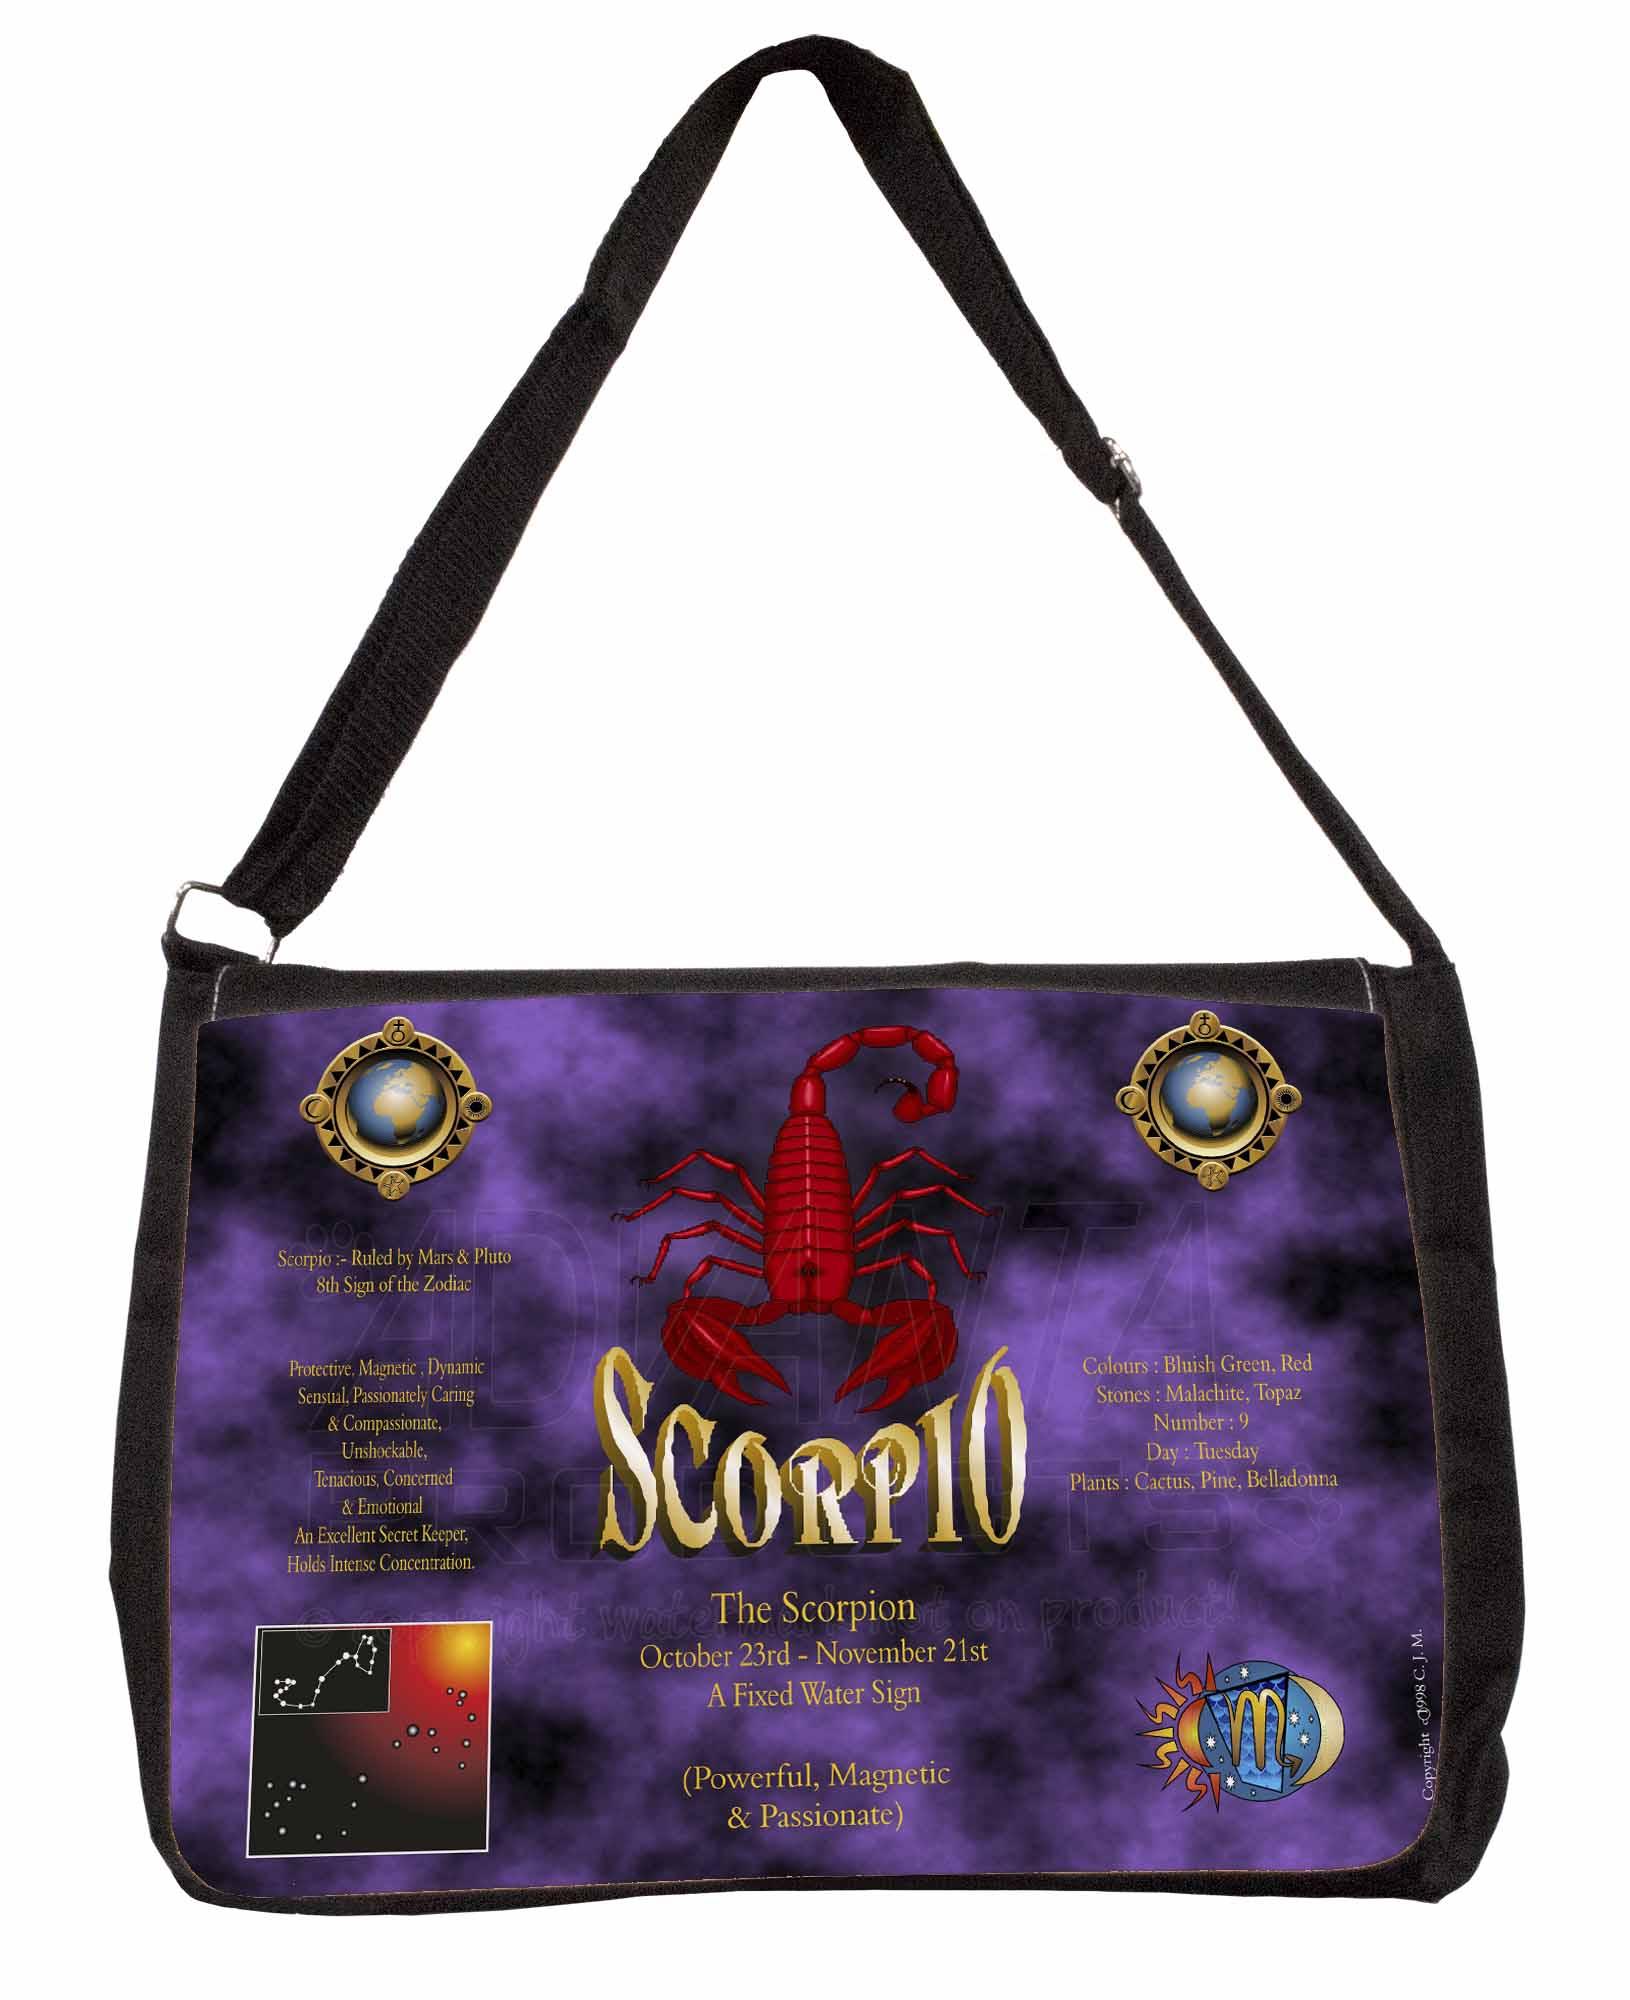 Details about Scorpio Star Sign of the Zodiac Large Black Laptop Shoulder  Bag School/, ZOD-8SB